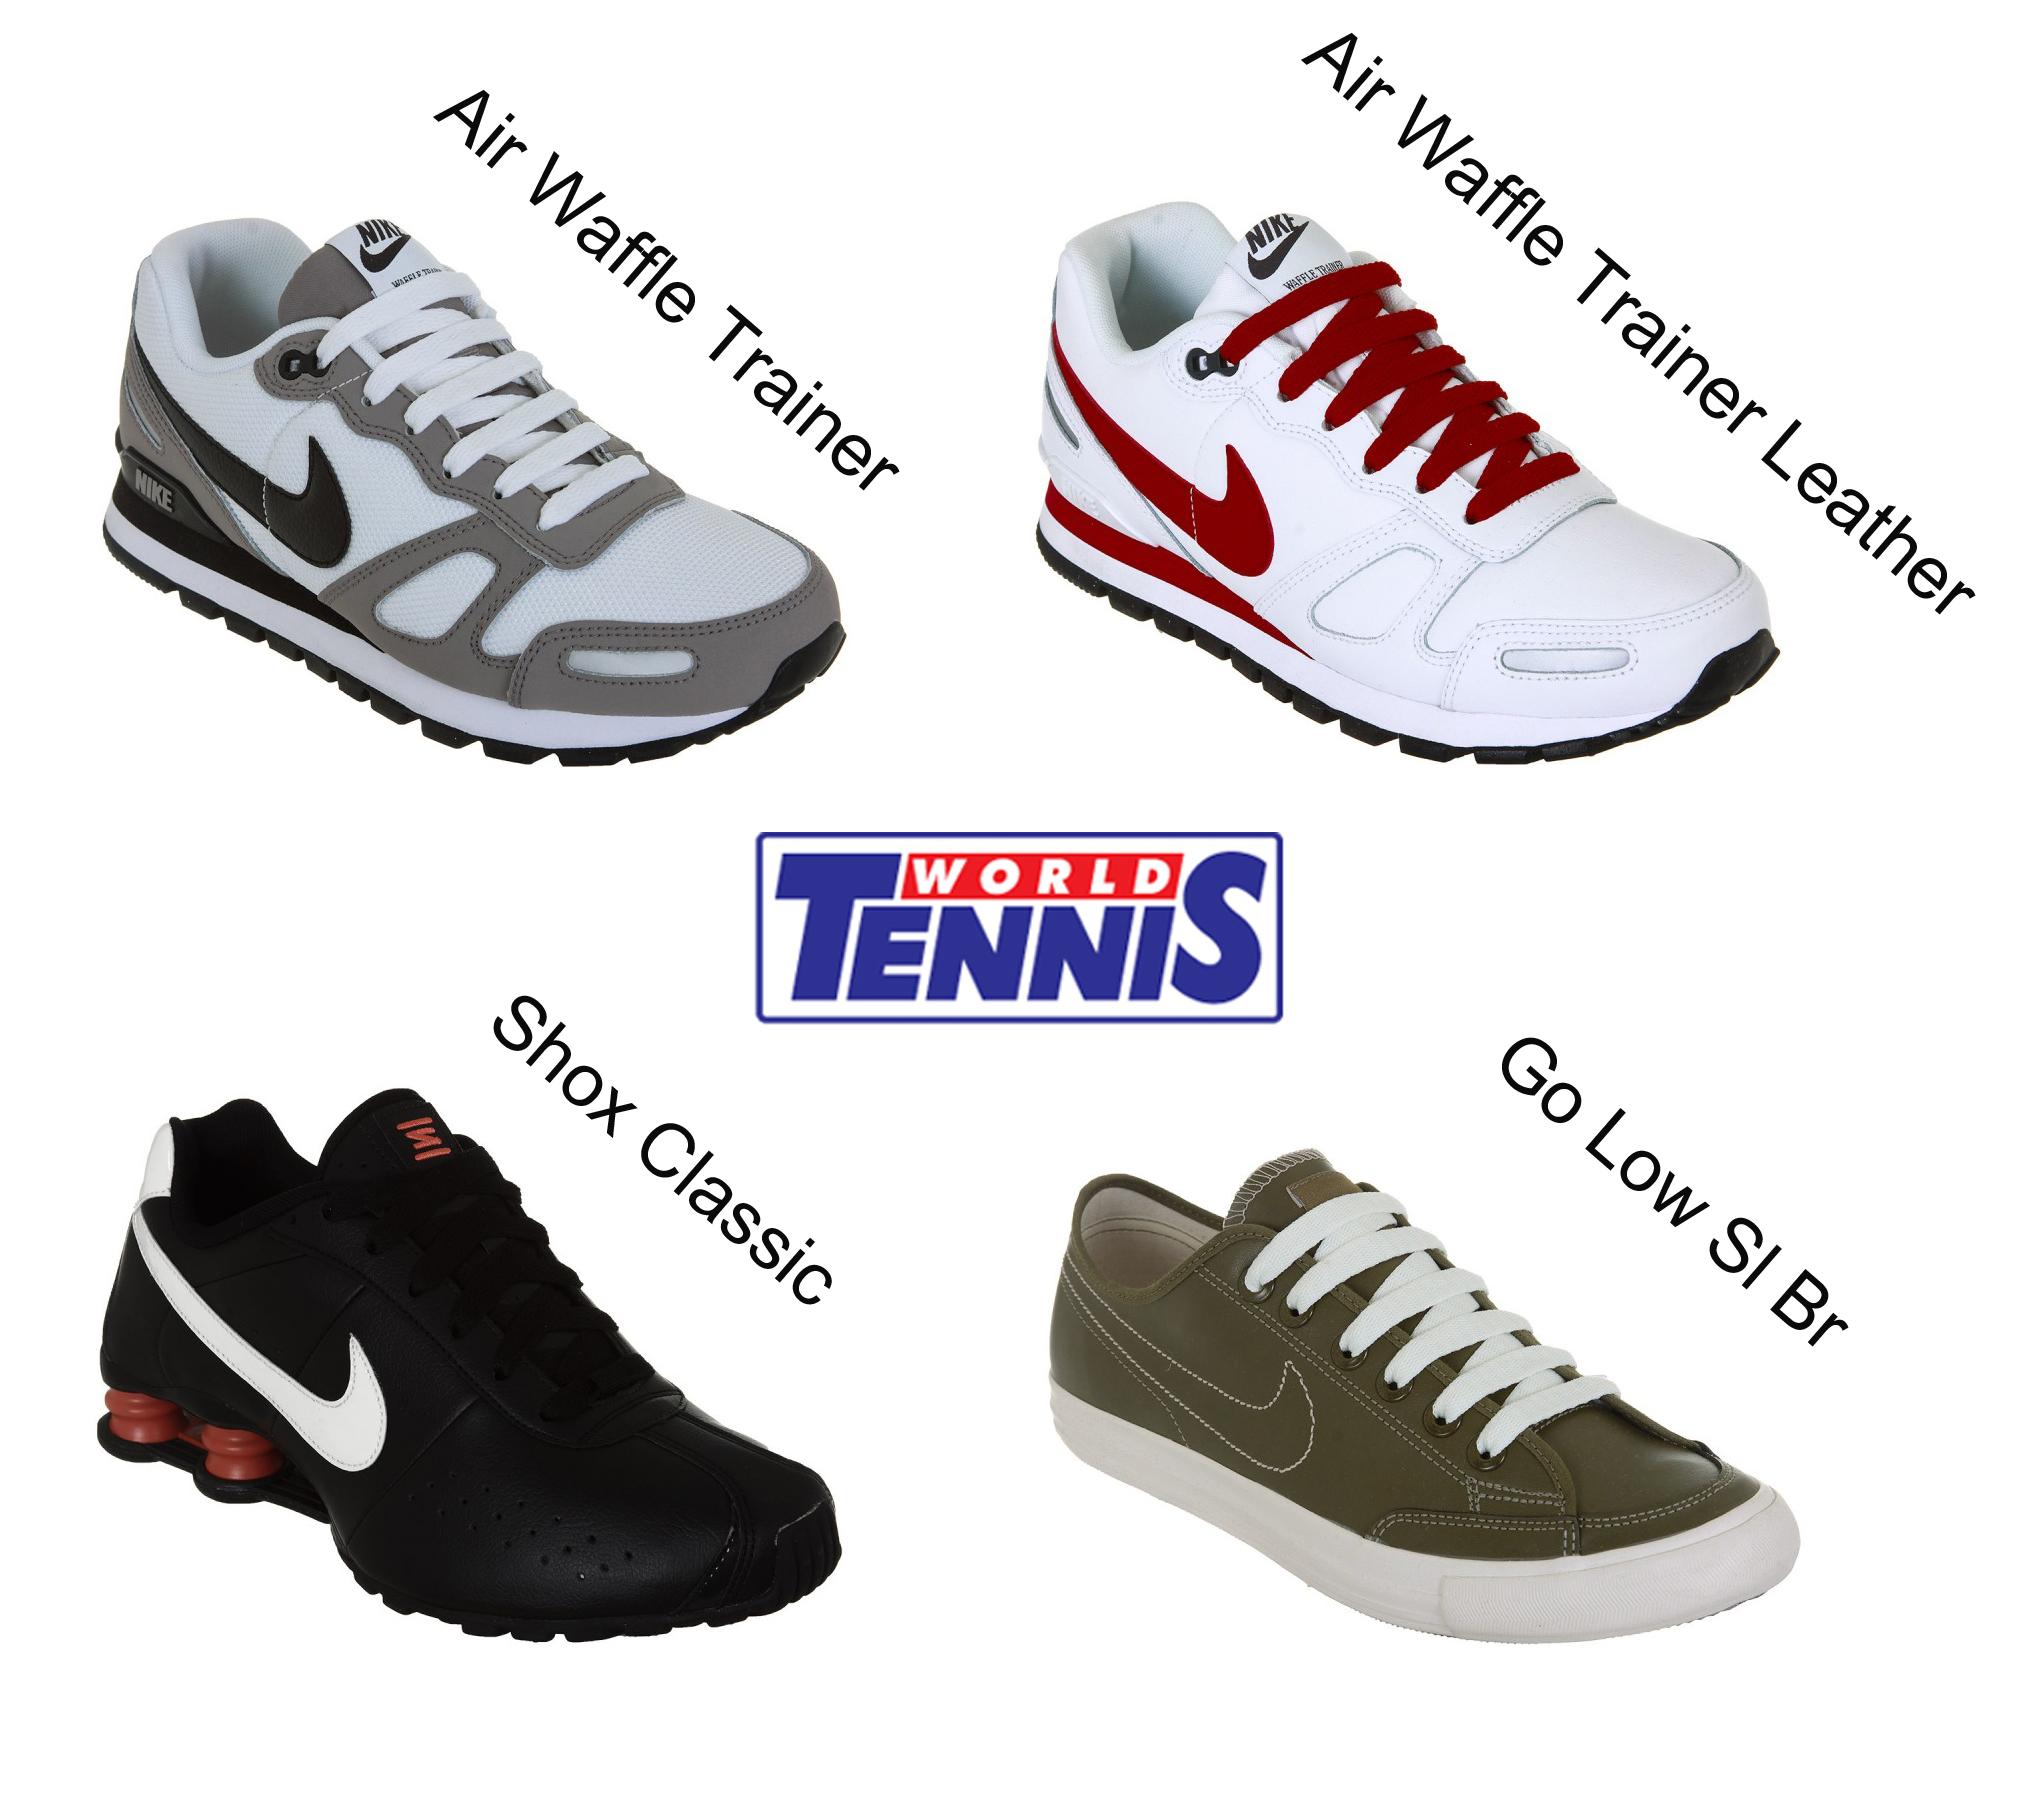 tenis nike promoçao world tennis